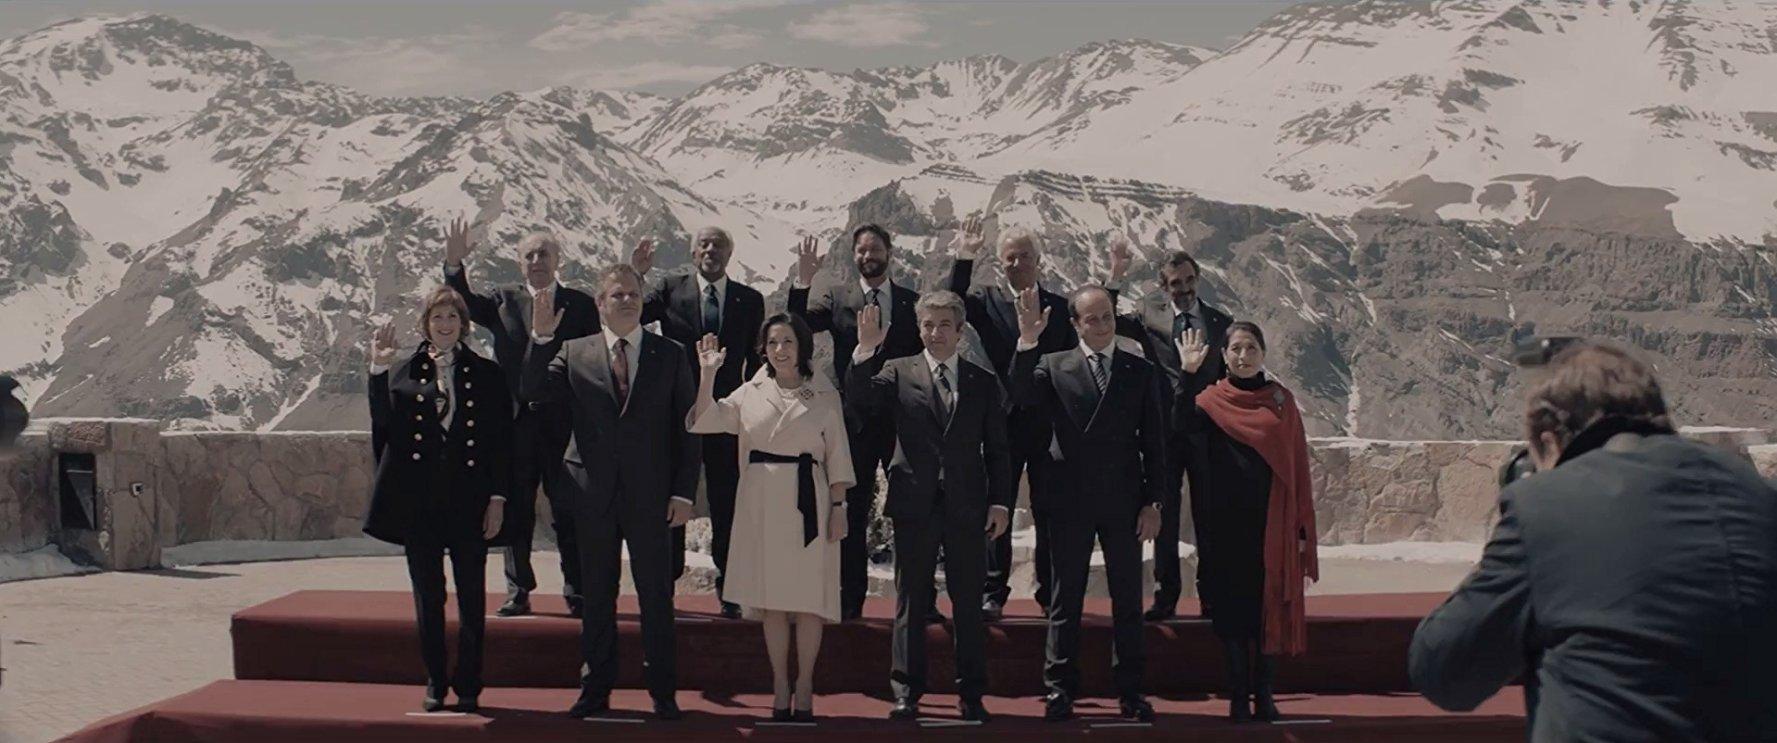 The Summit (La cordillera) [Sub: Eng]